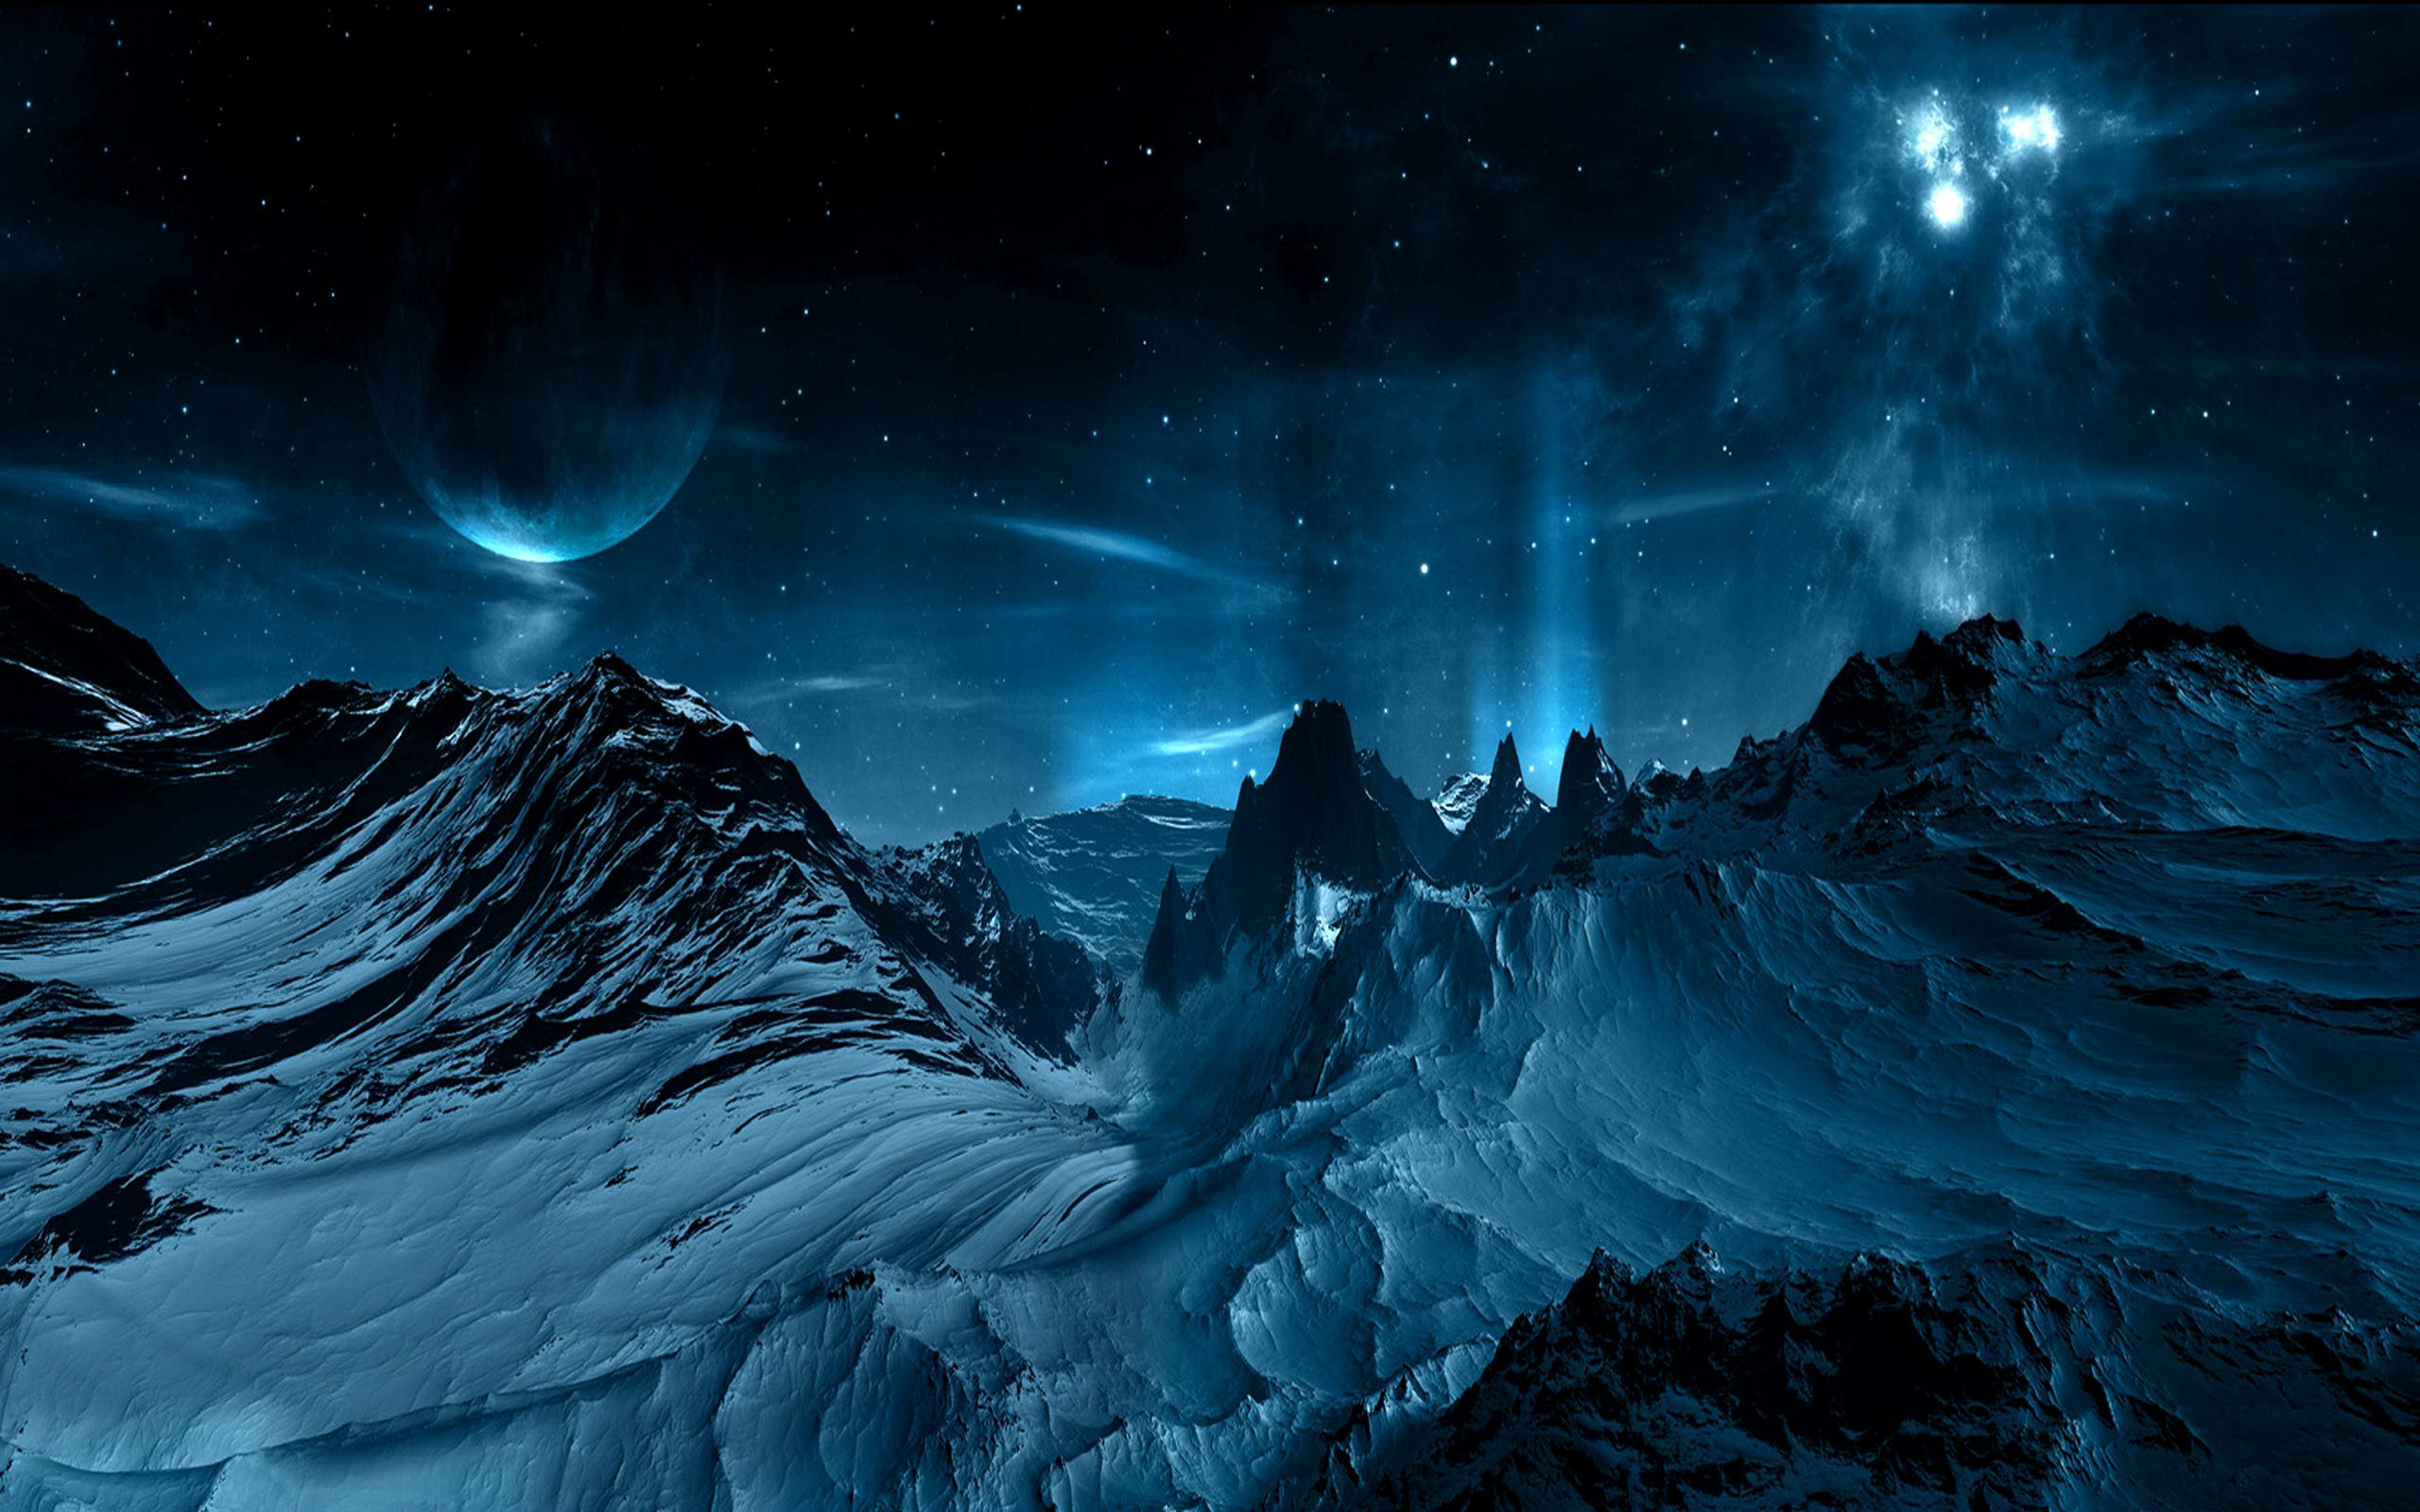 Sci Fi Landscape Wallpaper Sci Fi Landscape Blue Space Wallpaper Night Sky Wallpaper Landscape Wallpaper Sci Fi Wallpaper